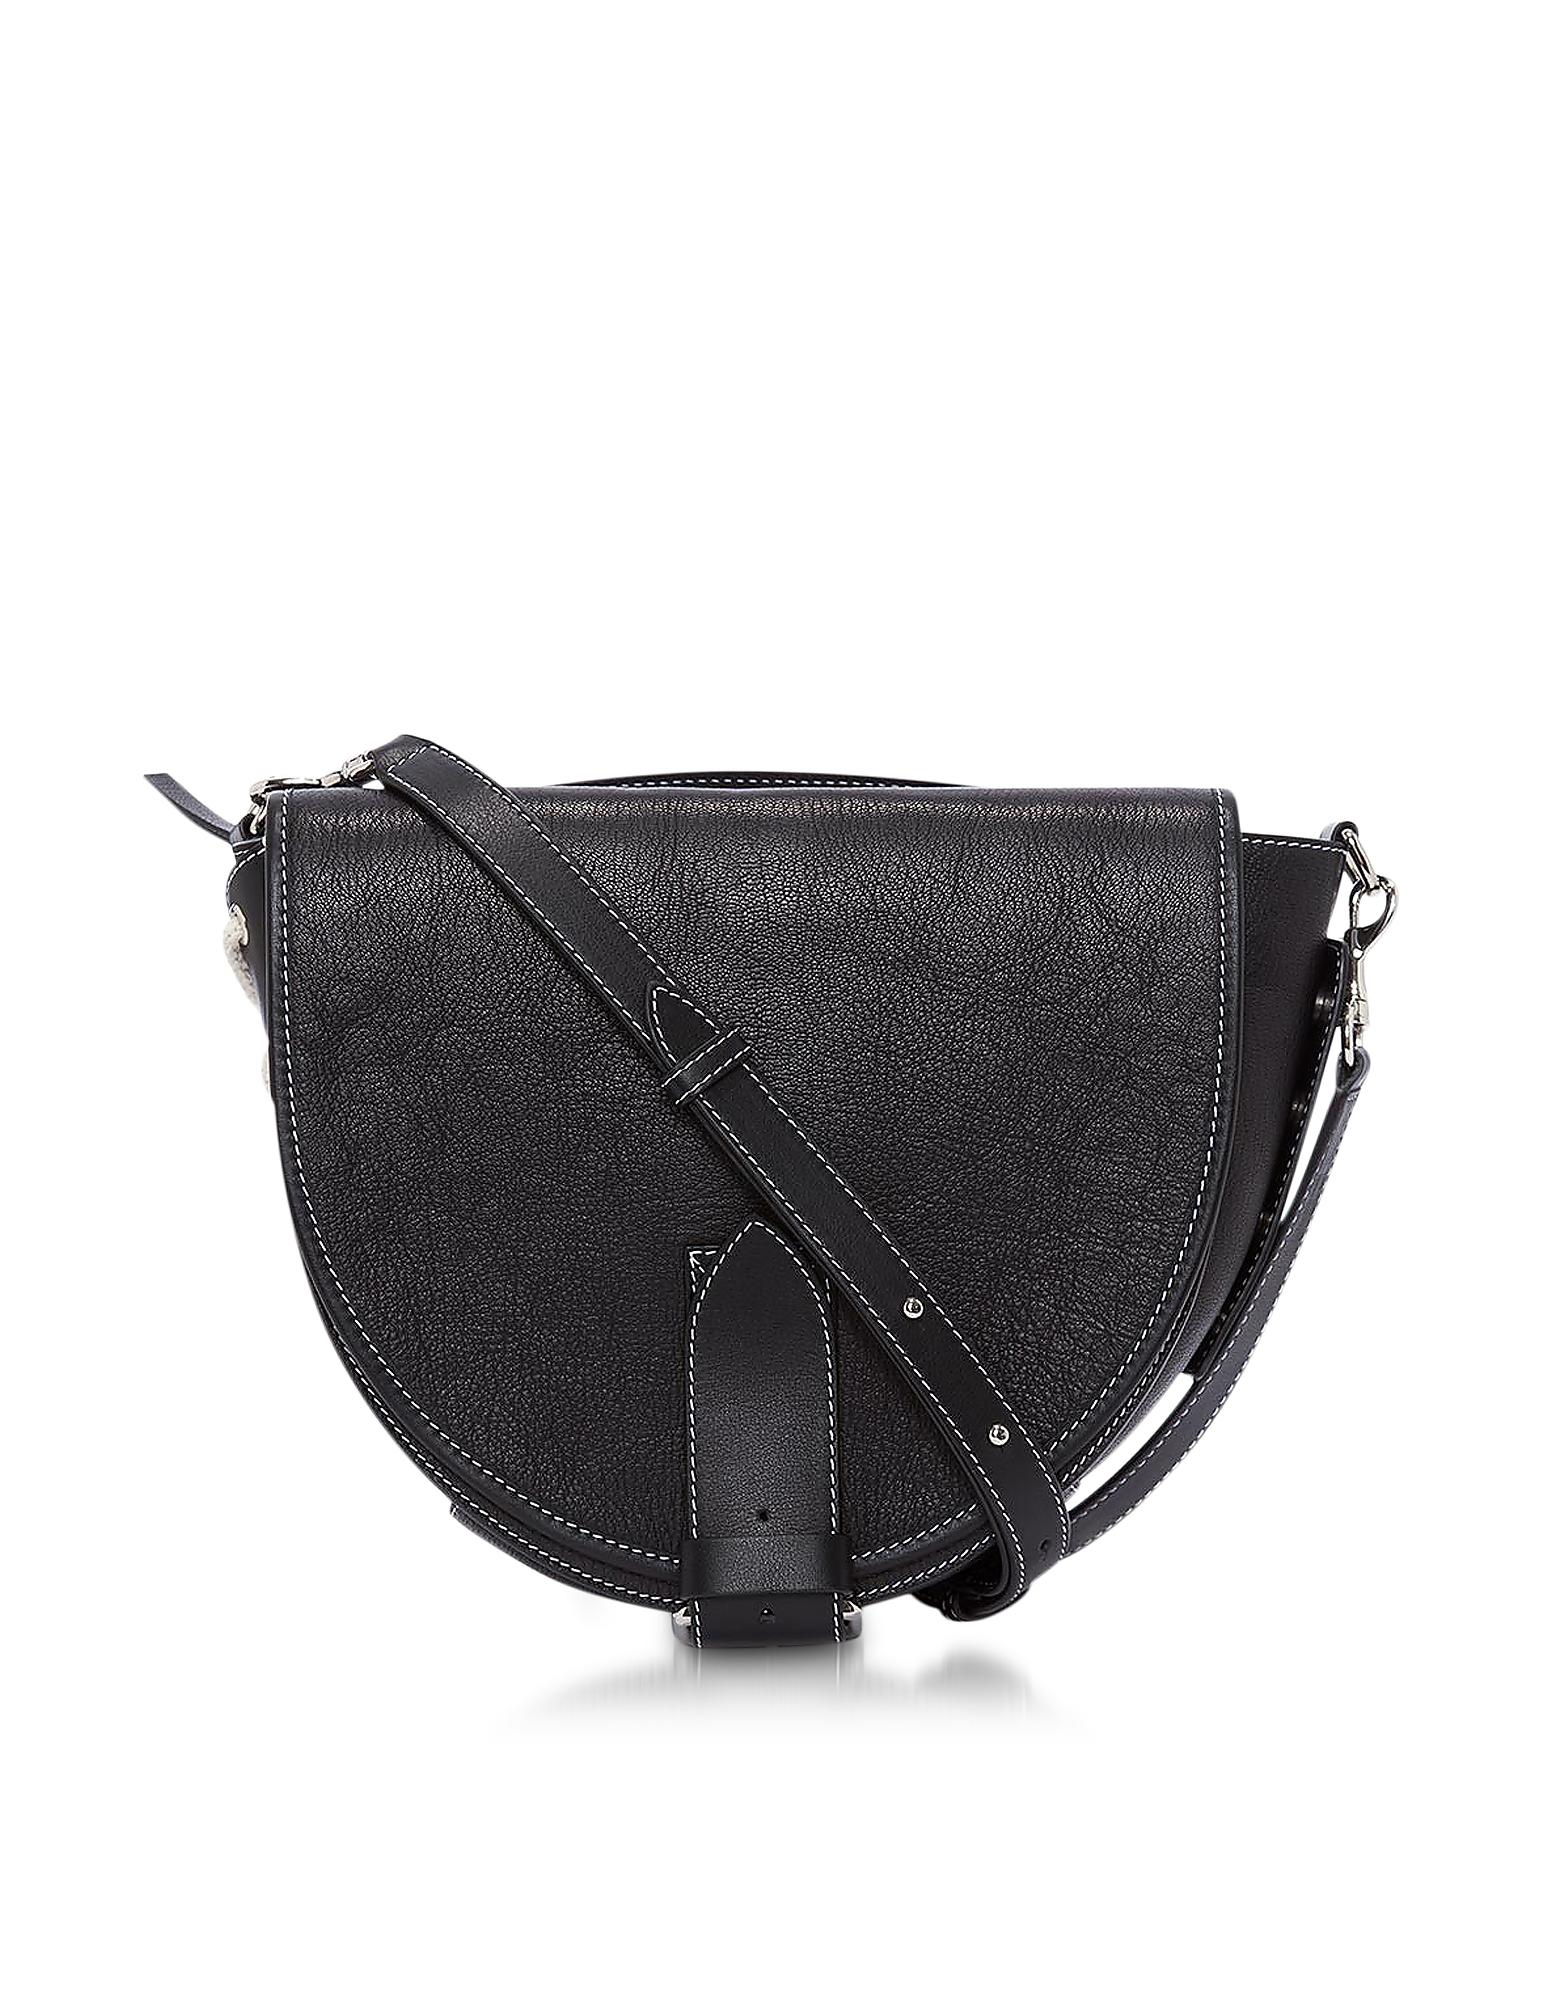 Genuine Leather Bike Bag w/Shoulder Strap